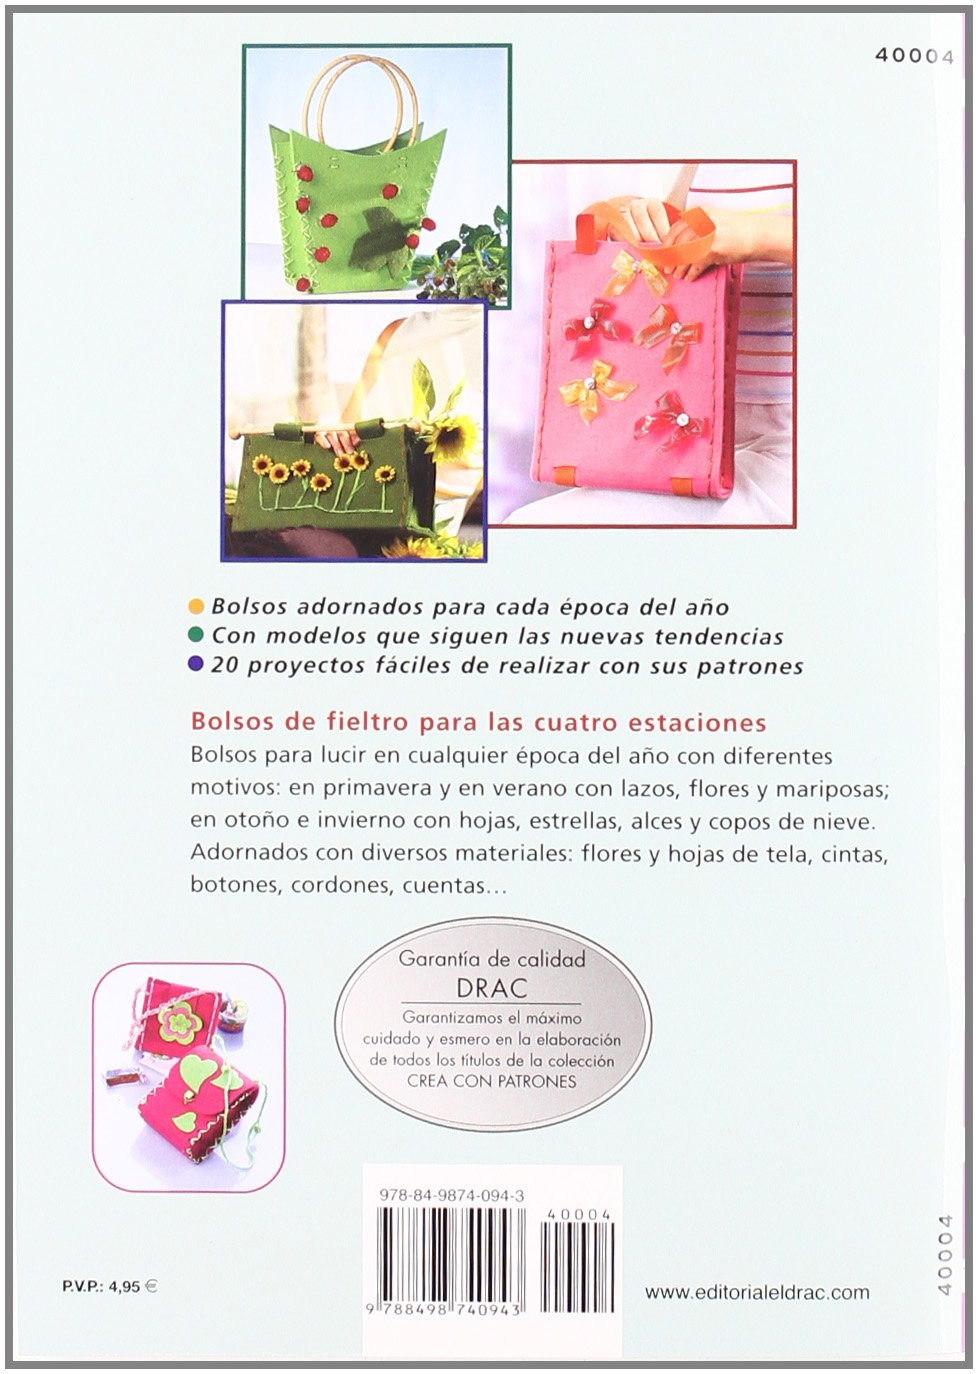 Bolsos de fieltro para epoca del ano: PETRA DECHENE: 9788498740943: Amazon.com: Books